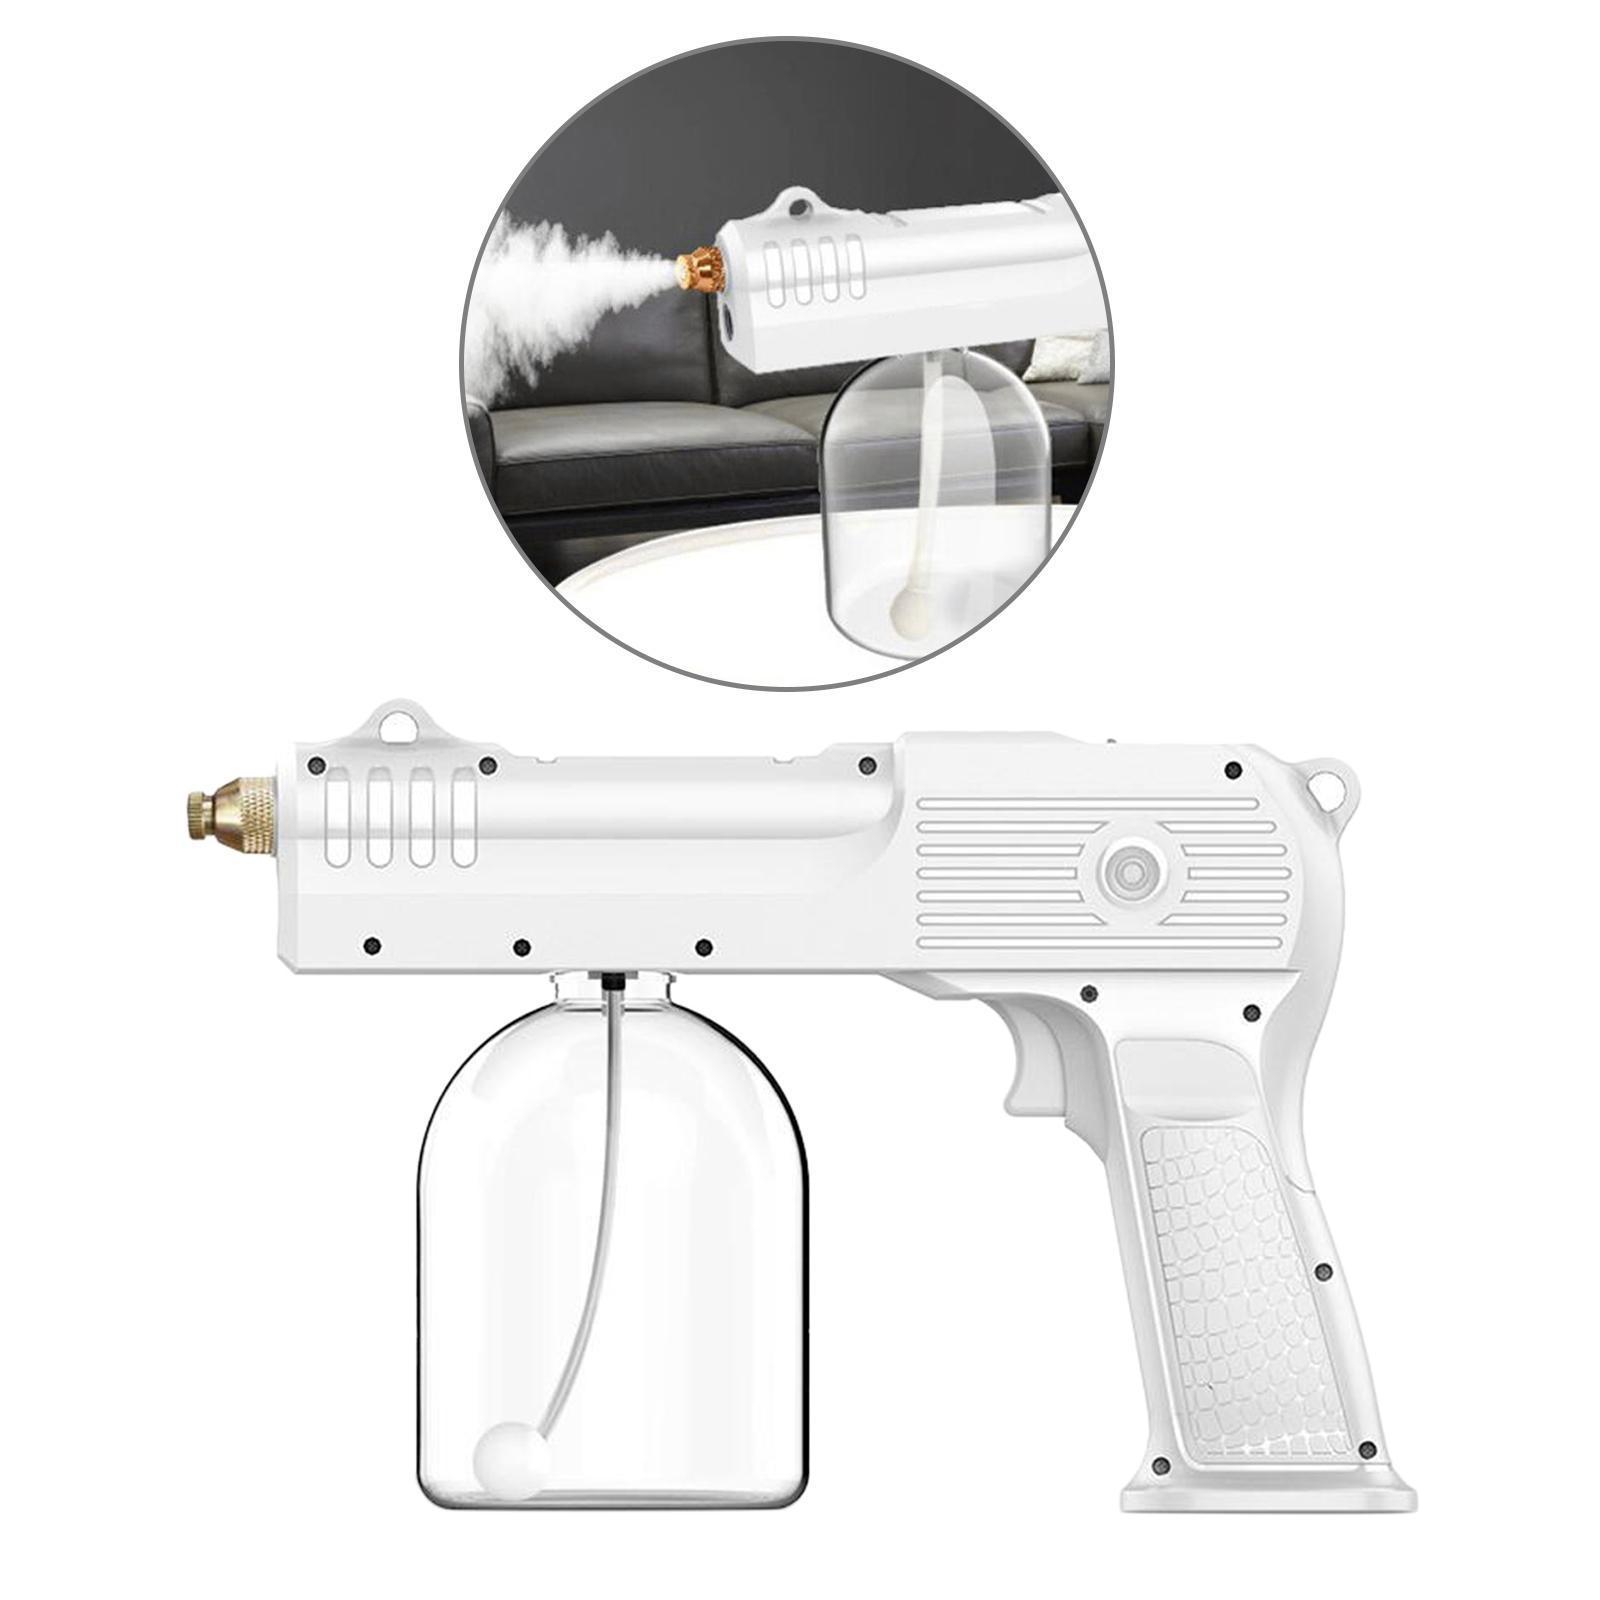 thumbnail 6 - 2x Cordless USB Nano Sanitizer Sprayer Disinfectant Fogger 500ml Spray Gun